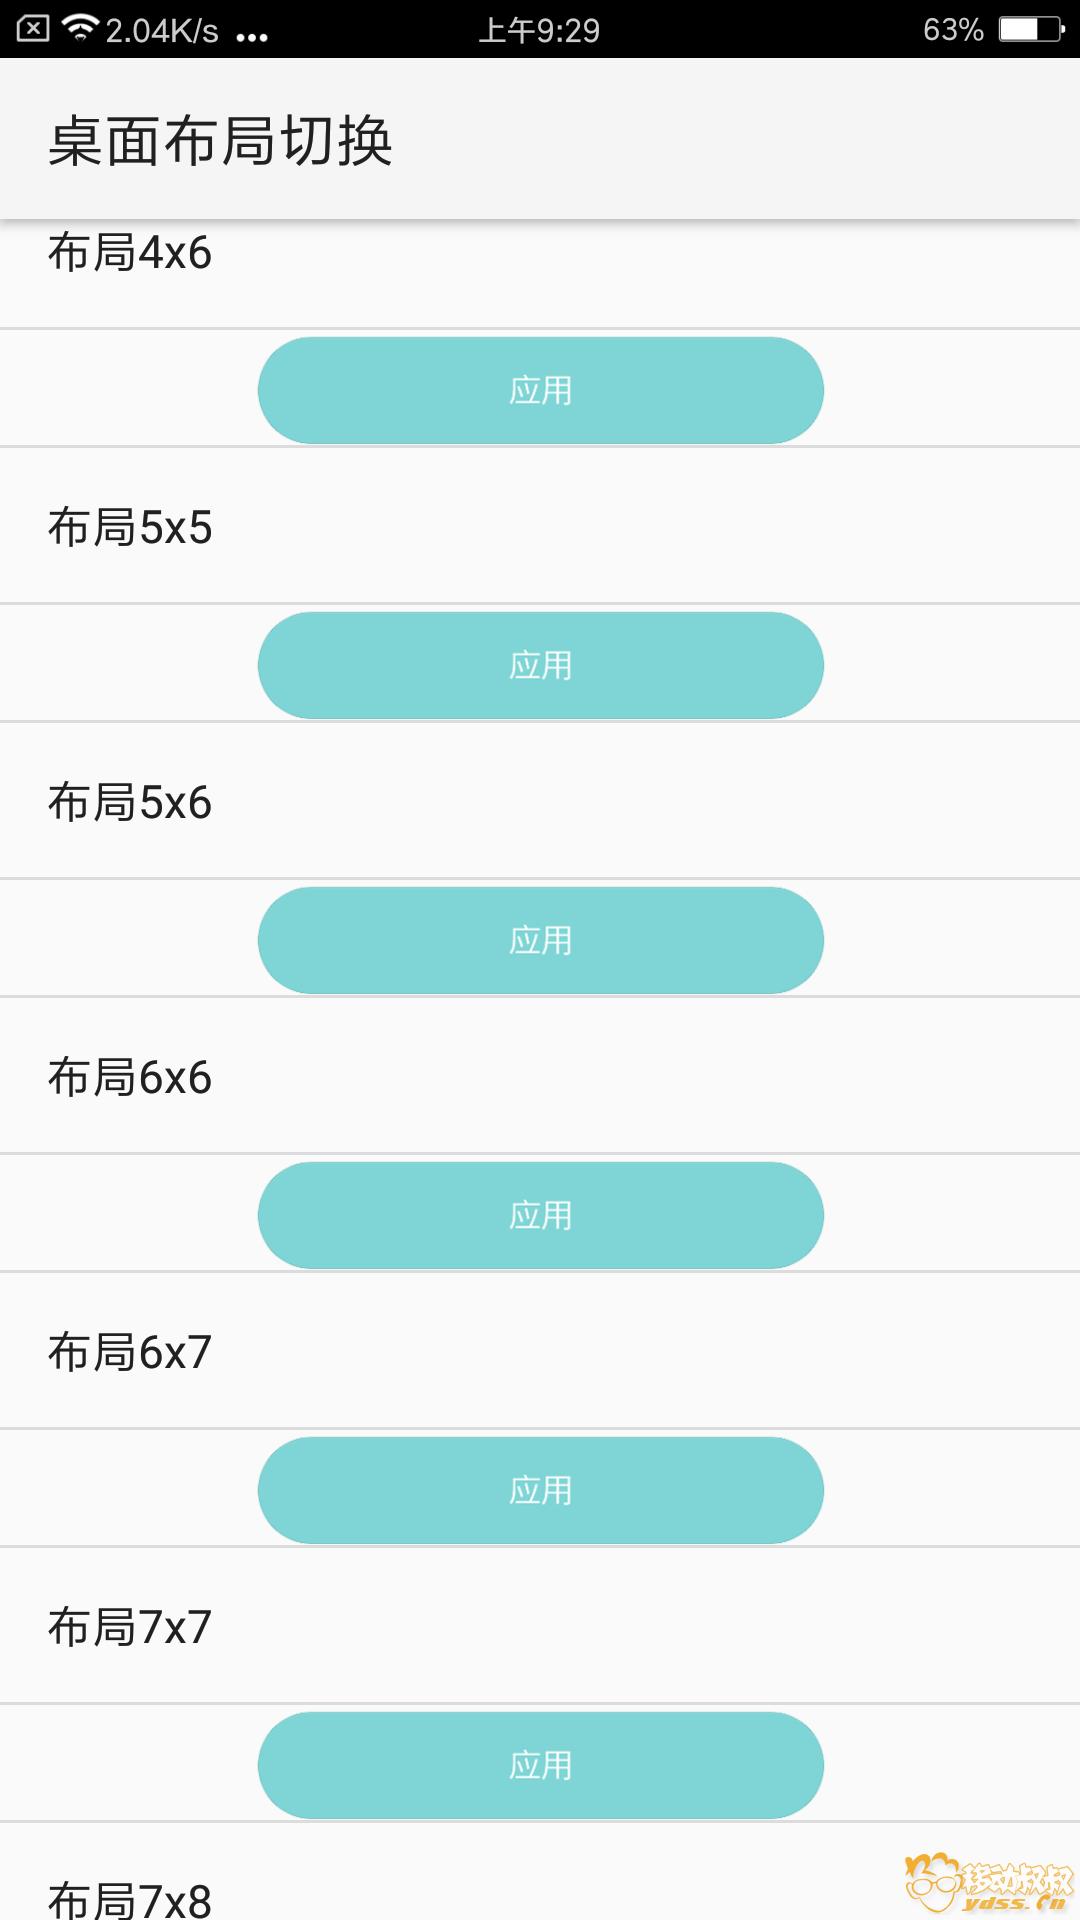 Screenshot_2018-03-13-09-29-12-505_com.nkll.settings.png